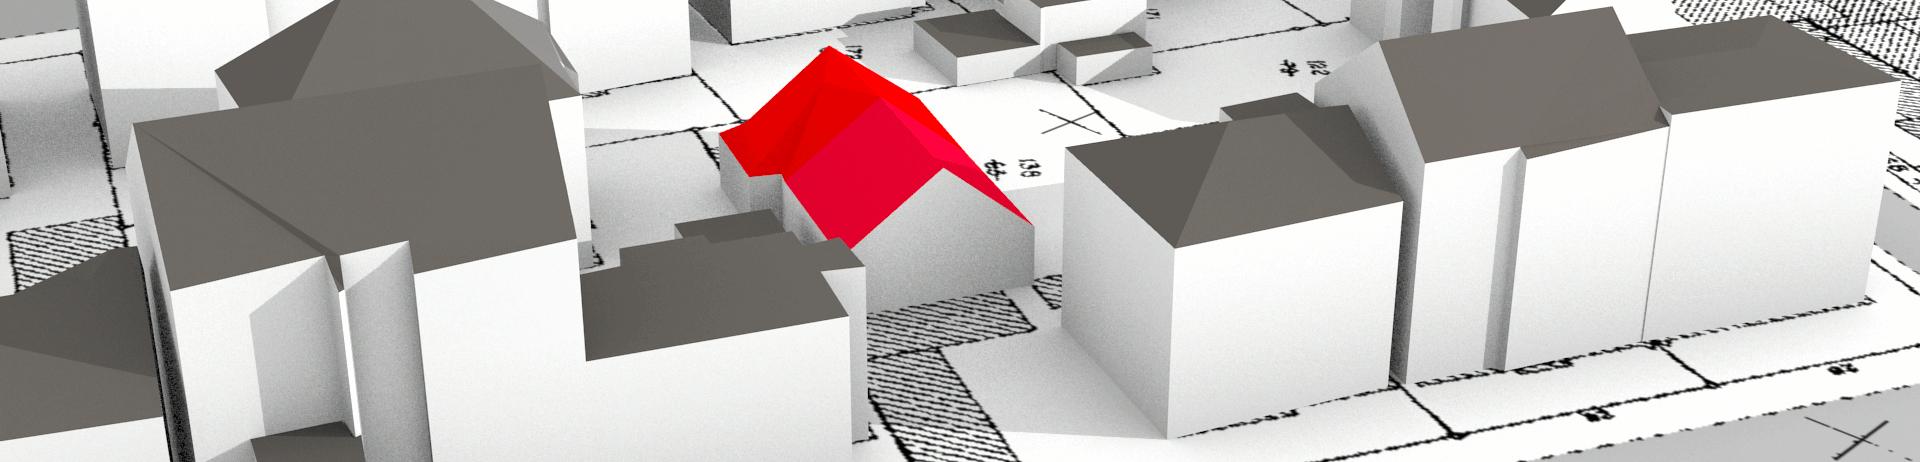 Illustration de résultats de SimPLU3D